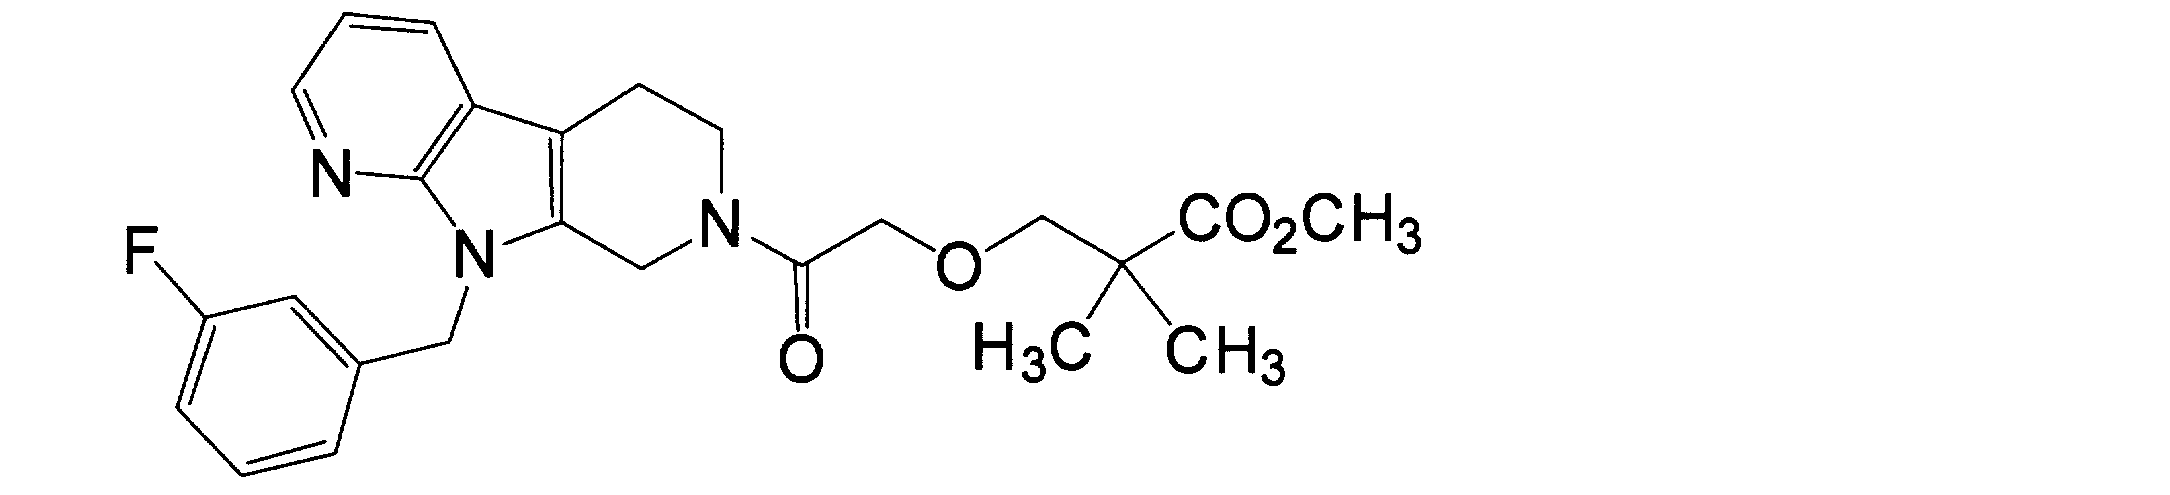 Figure JPOXMLDOC01-appb-C000071